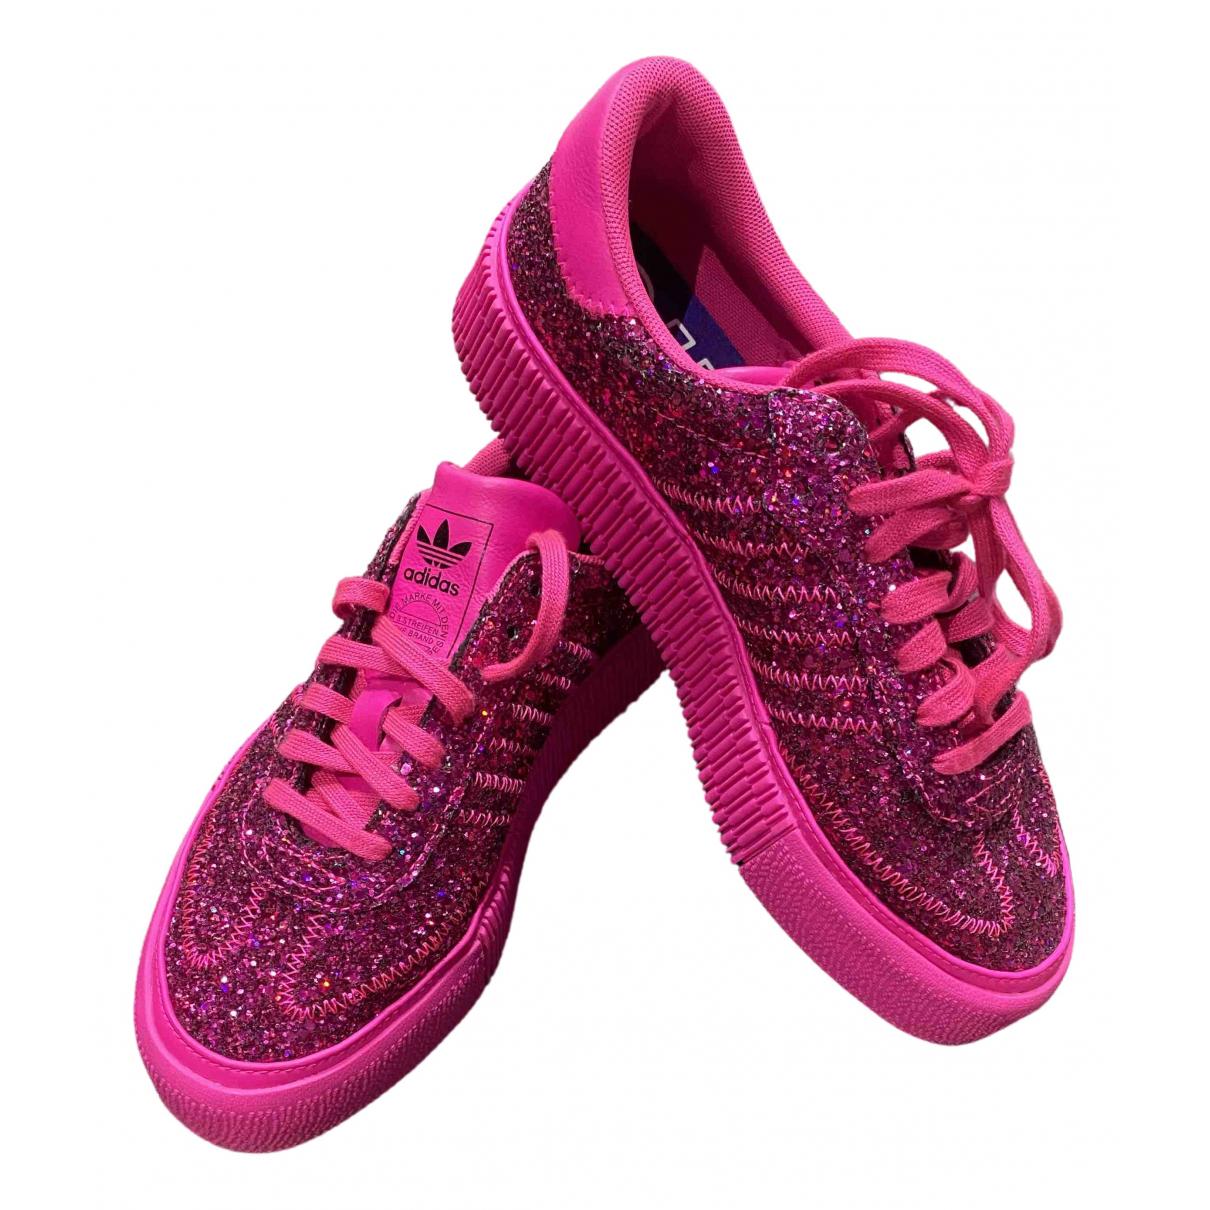 Adidas \N Pink Glitter Trainers for Women 37.5 EU